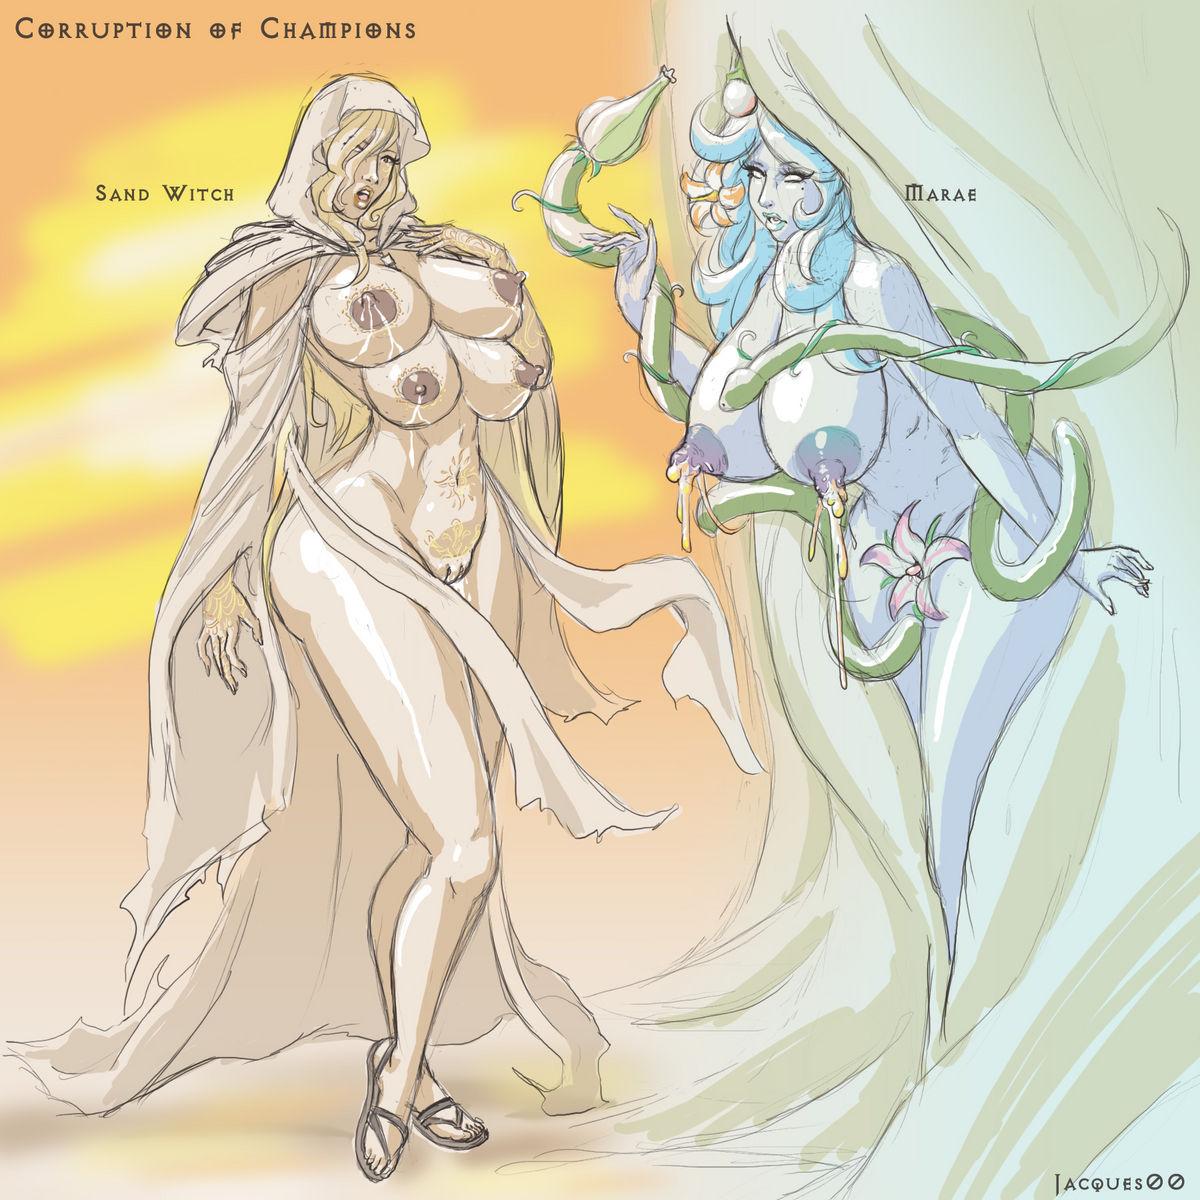 corruption amily of champions wiki Life is strange chloe nude